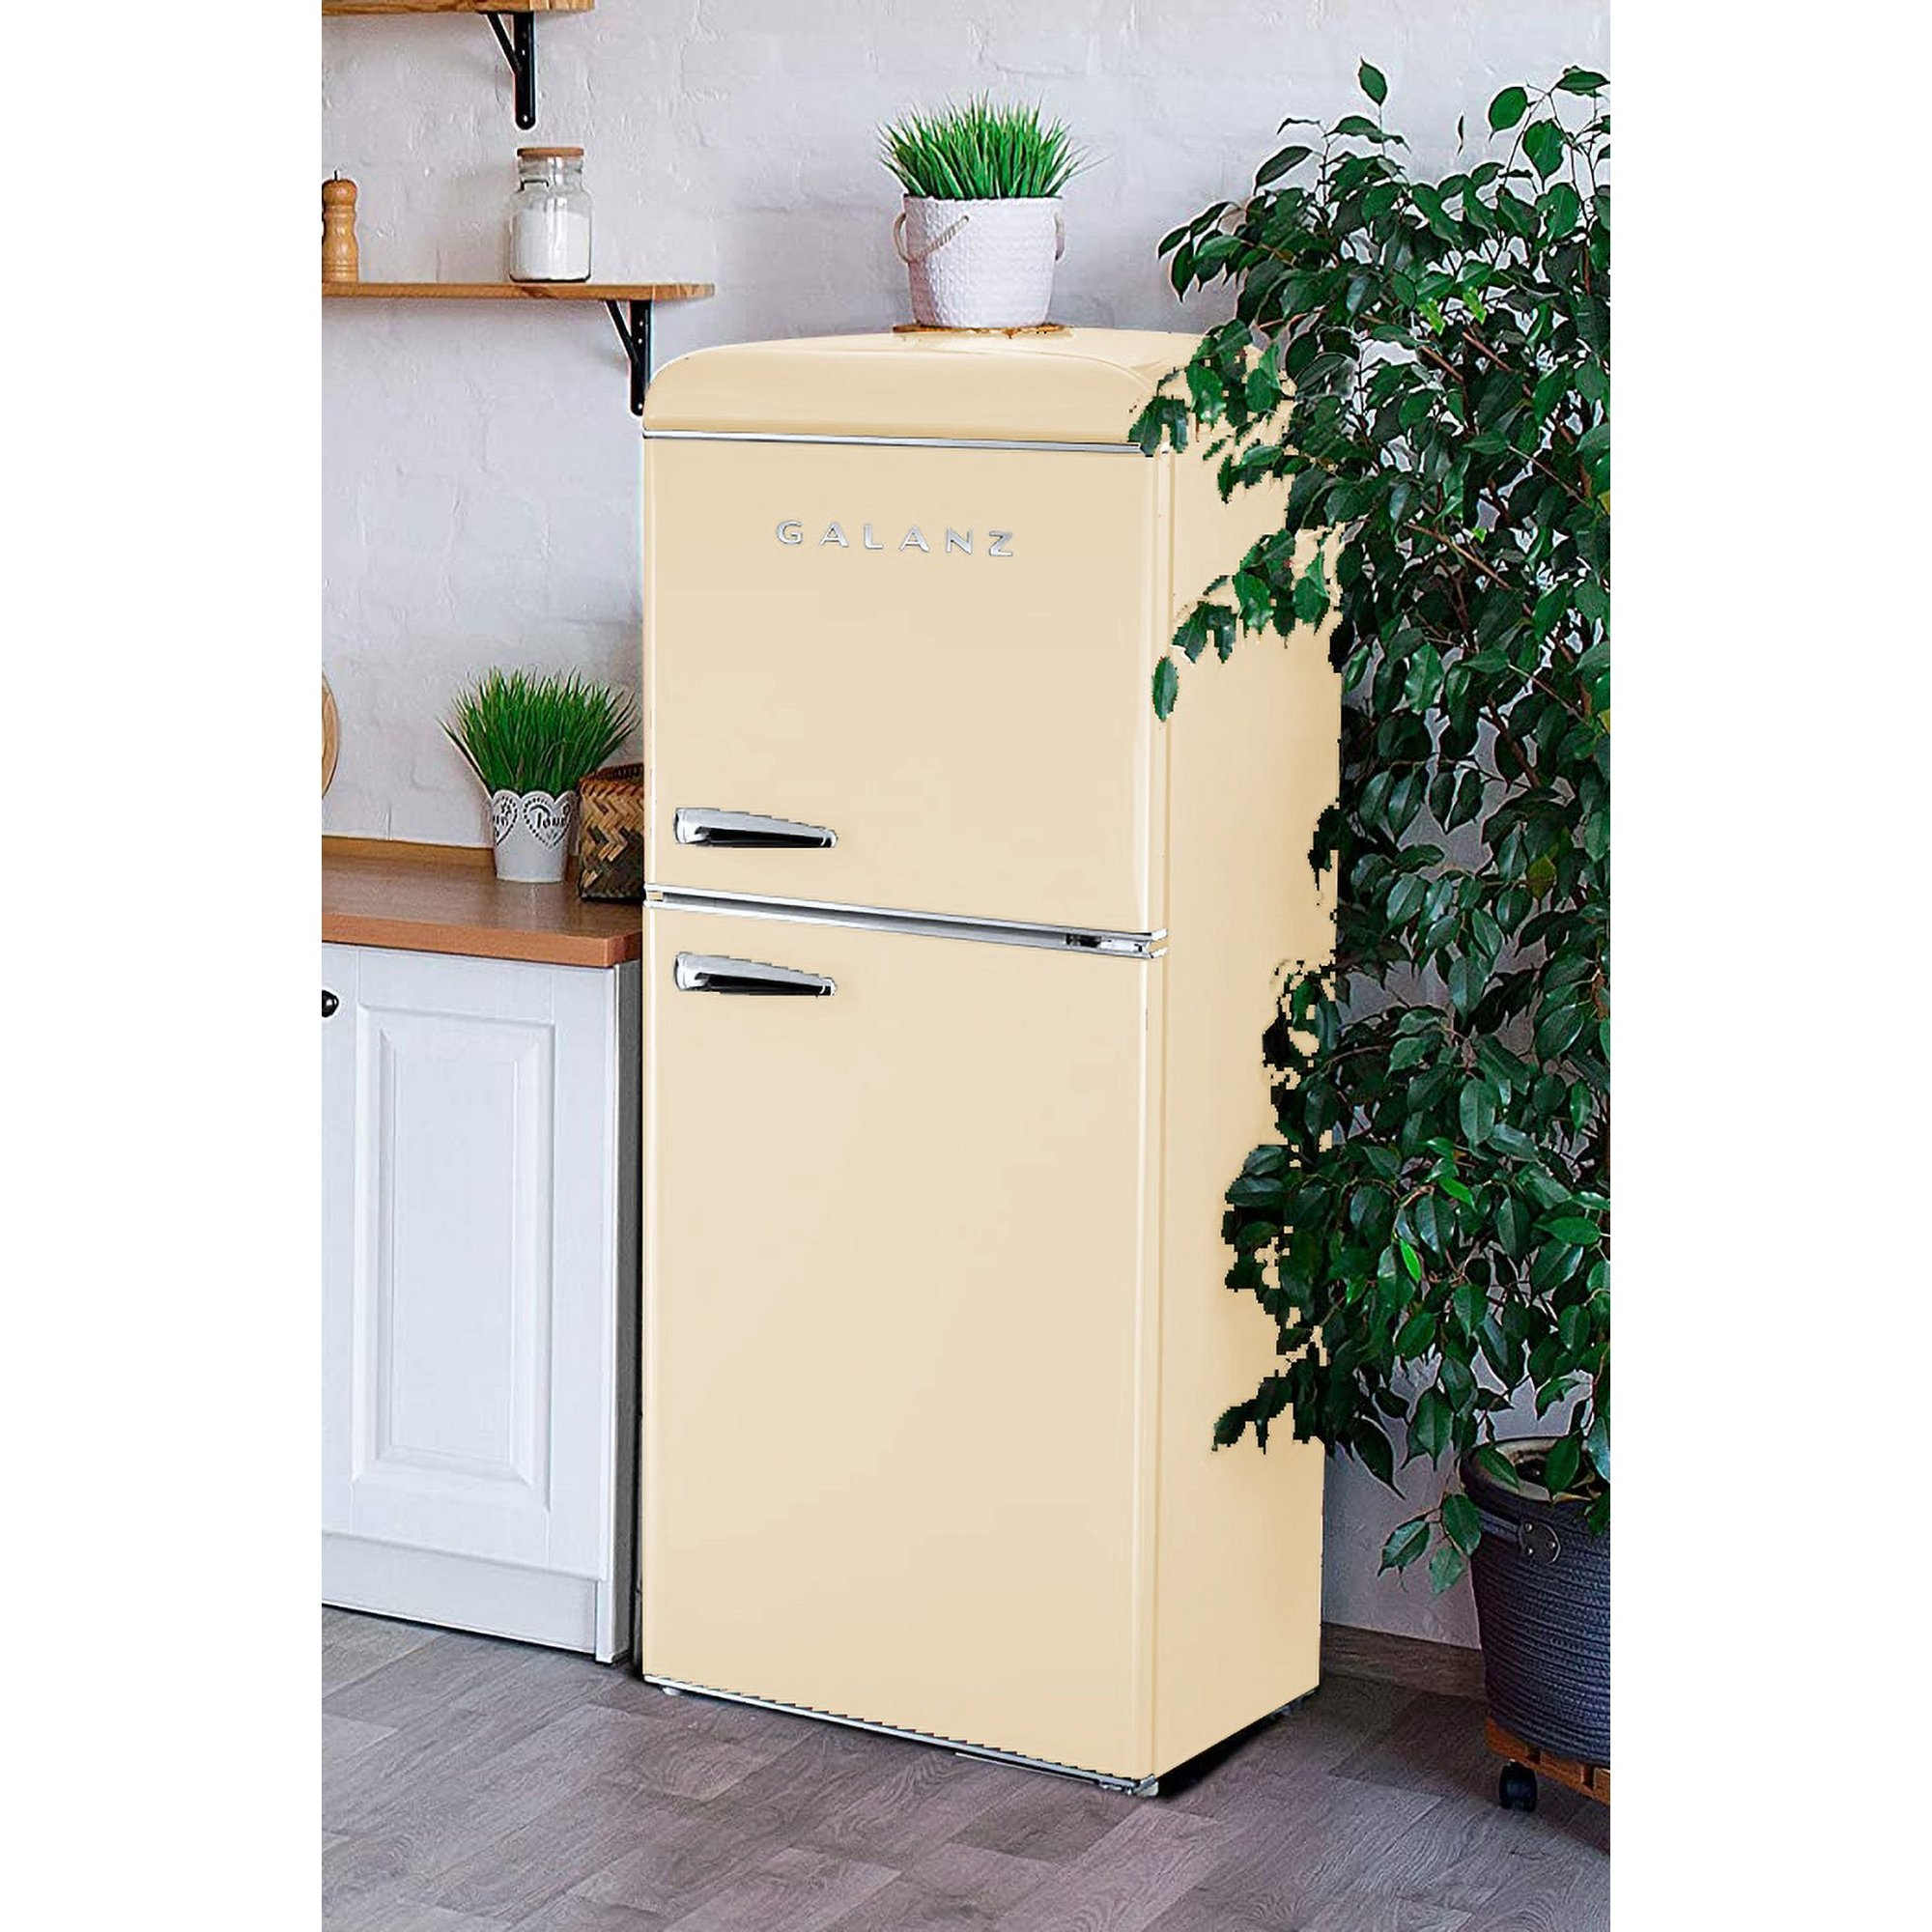 Image of Galanz 215L Retro Fridge Freezer